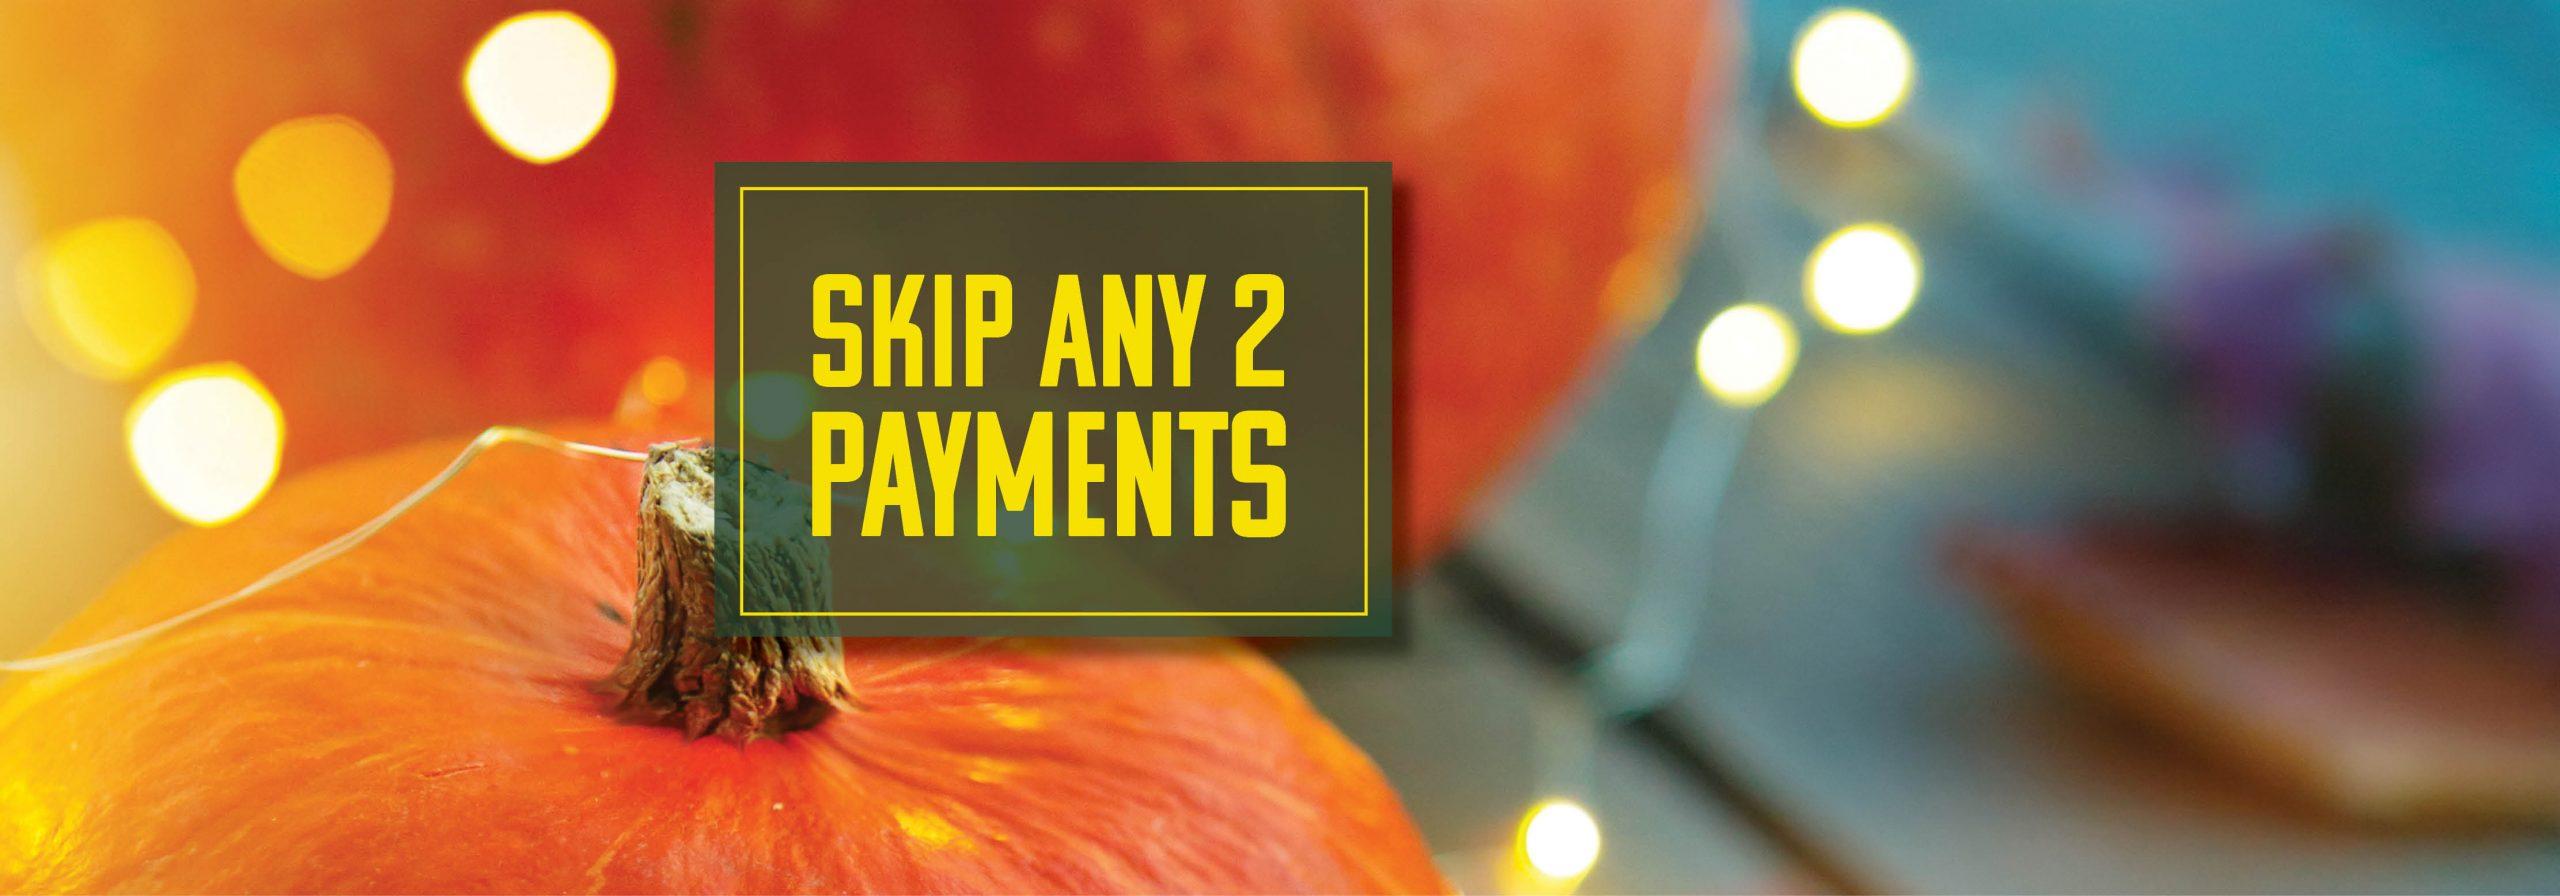 skip a pay image slide